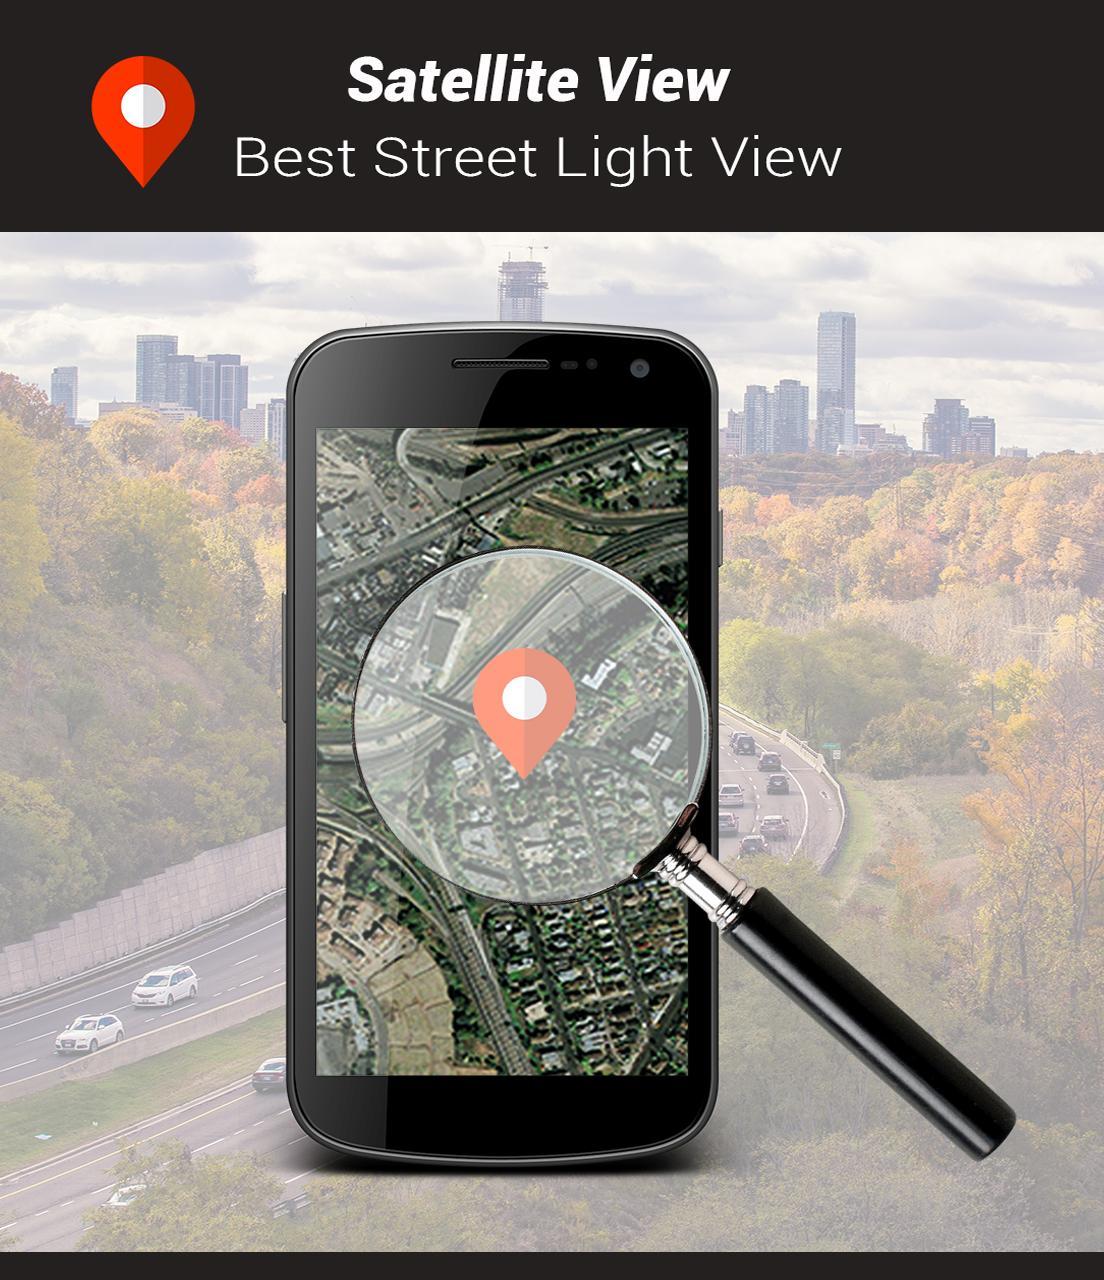 спутниковая карта на телефон без интернета